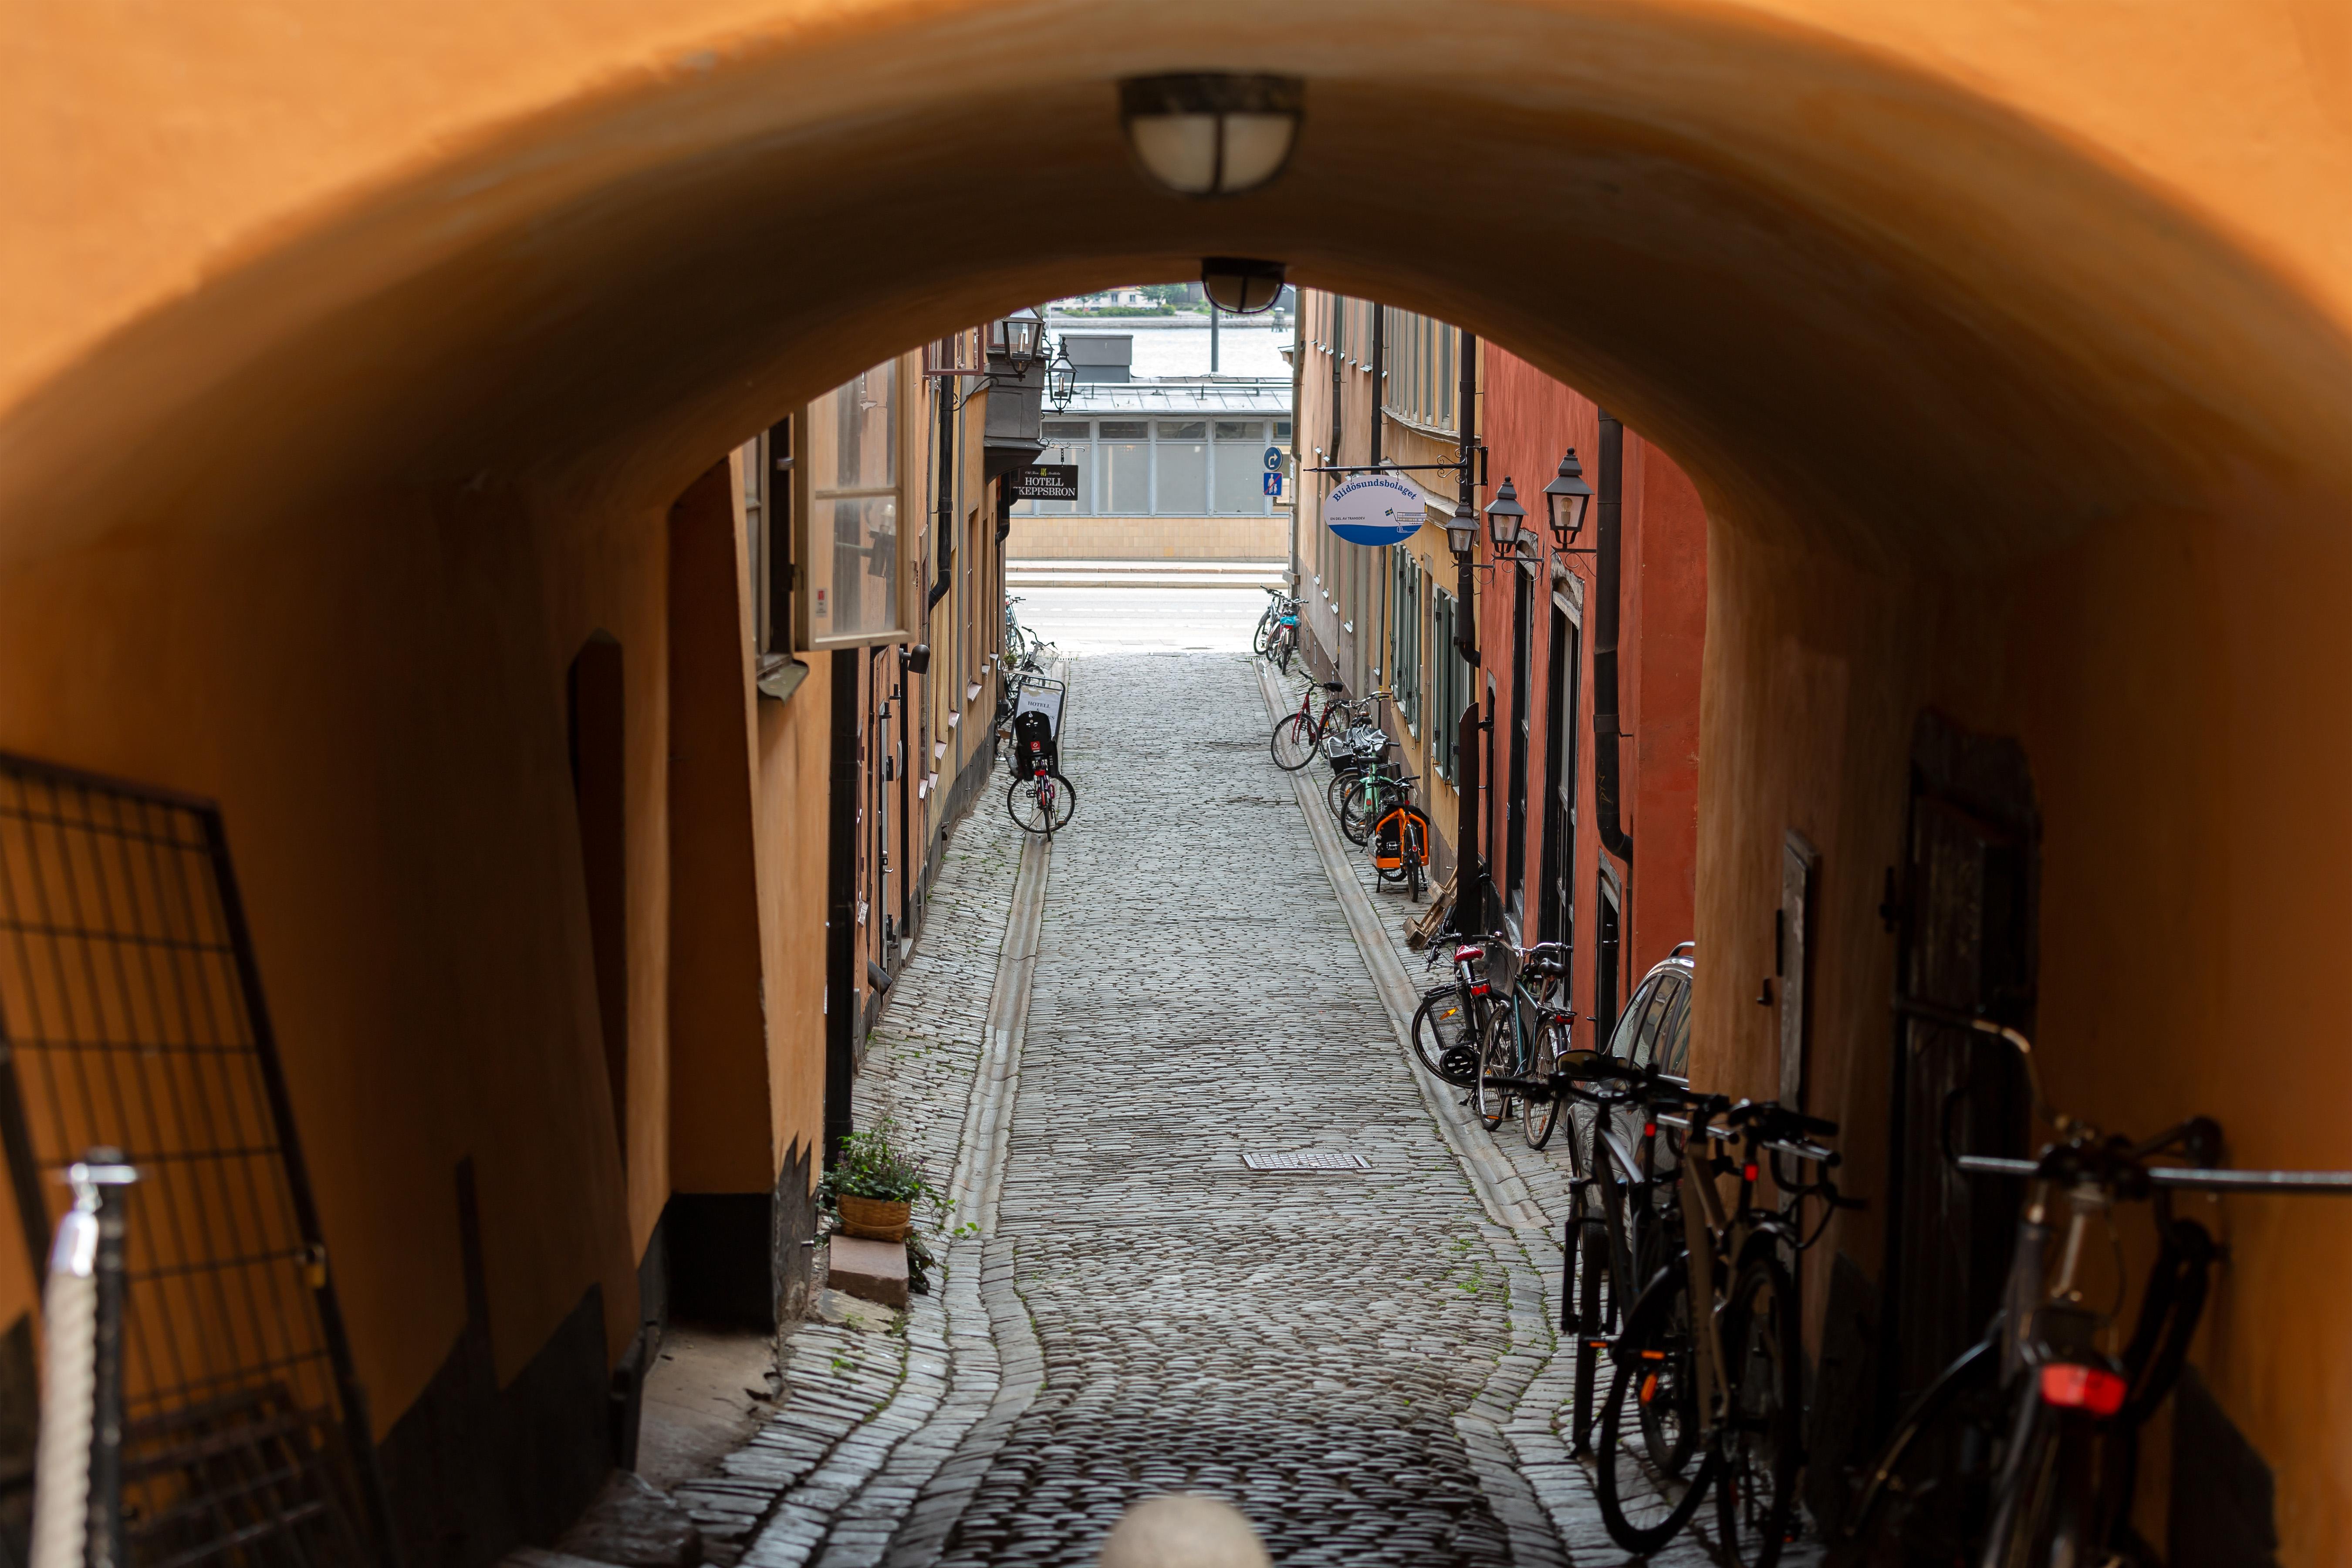 Stockholm gratis online dating sex knul eskort rosa chattsidor